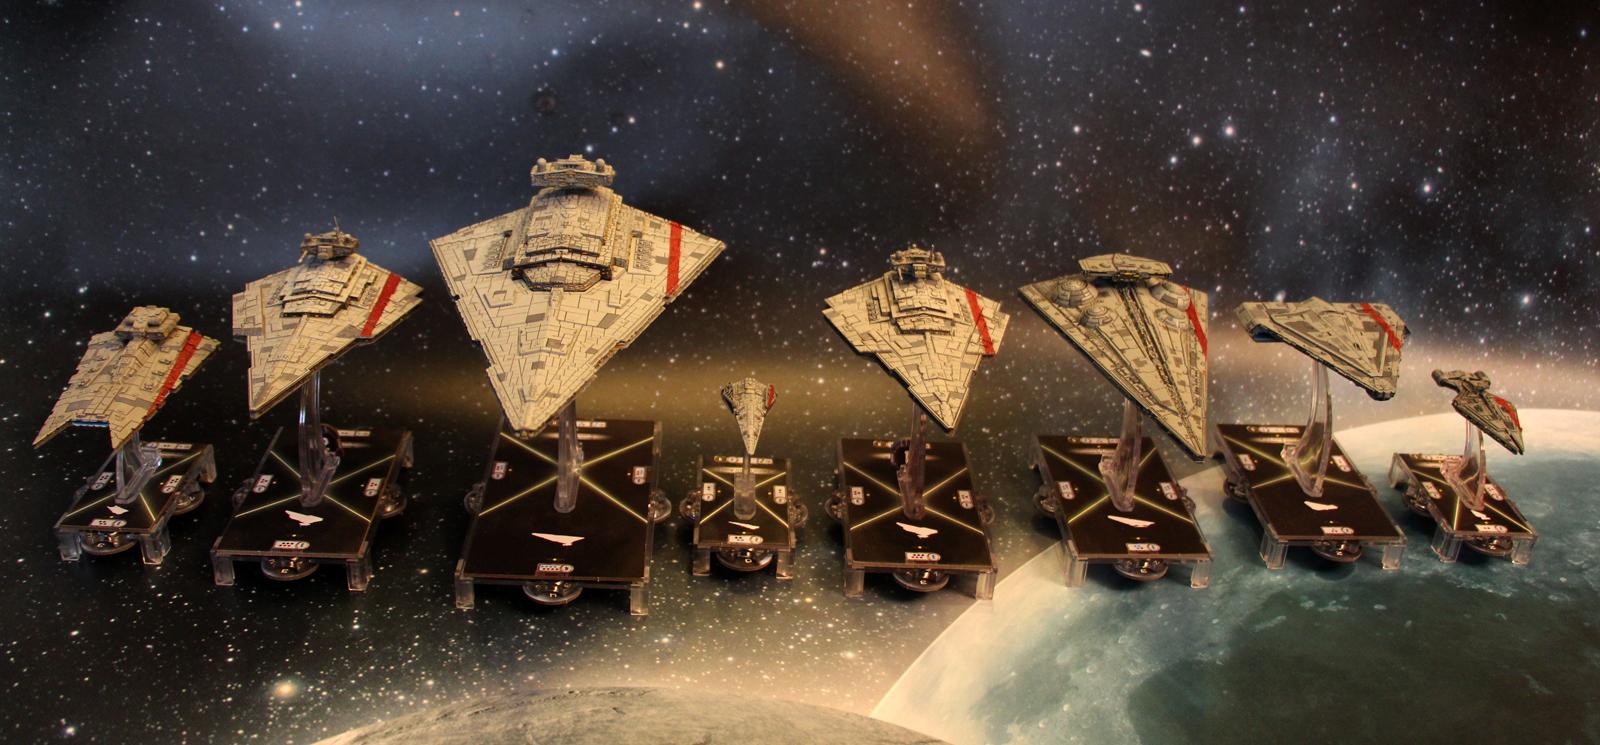 La flotte Dagornienne... Flotte-Imperiale-BarreRouge1